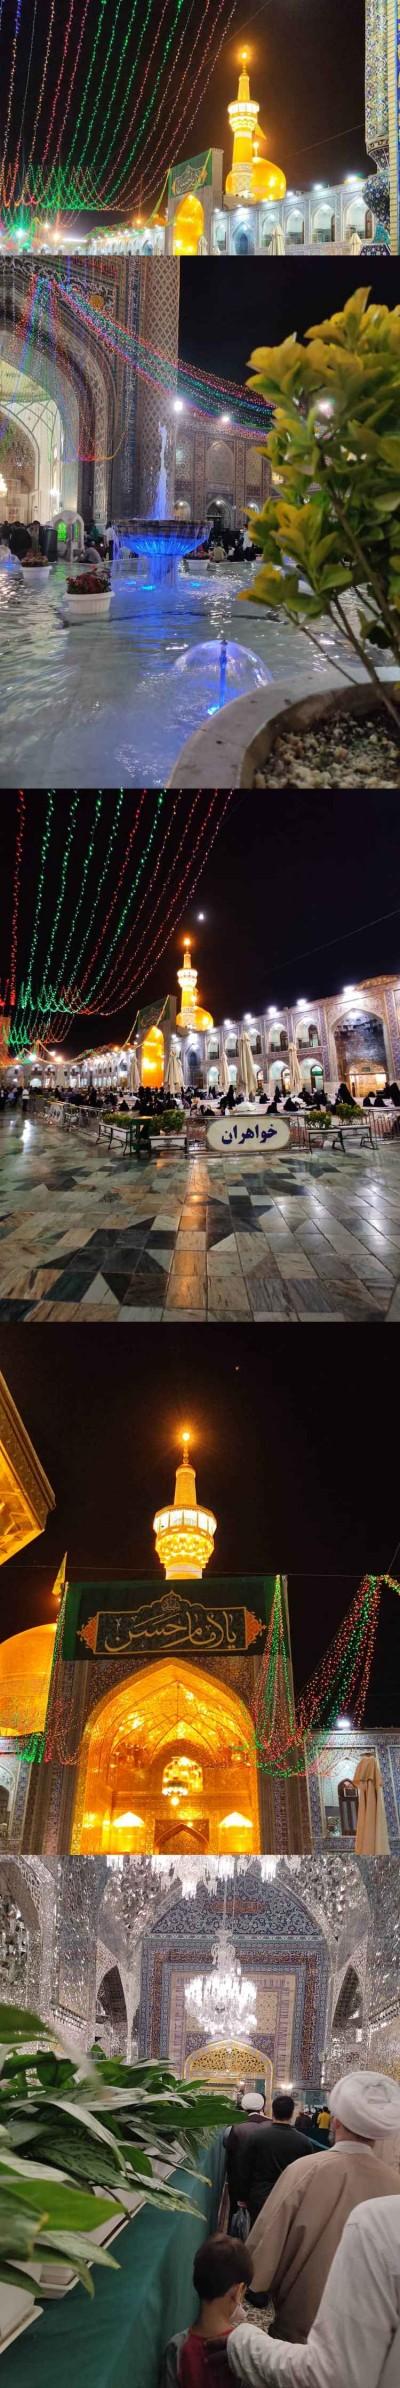 I was at the shrine of Imam Reza tonight | hossein.salmani | Digital Drawing | PENUP